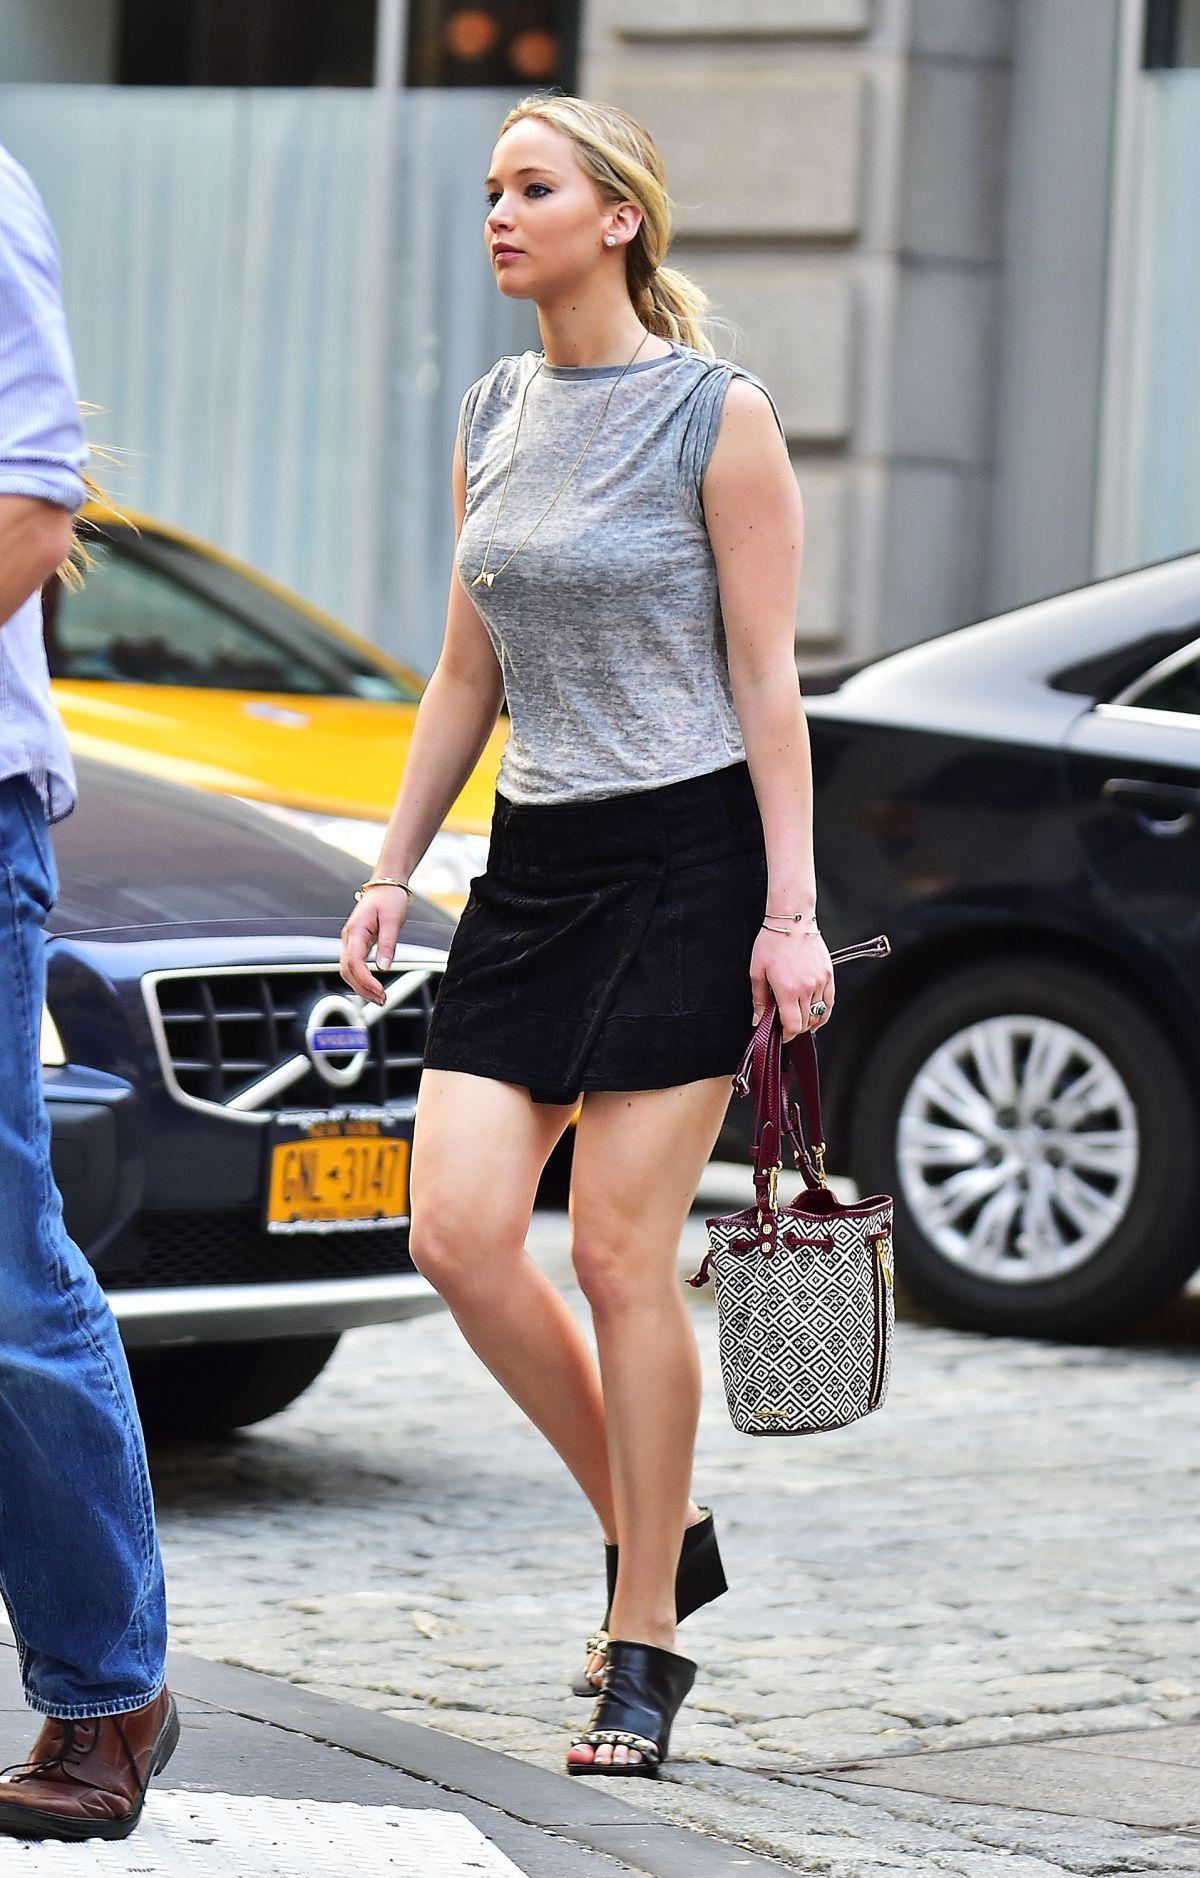 XXX Cate Blanchett foto